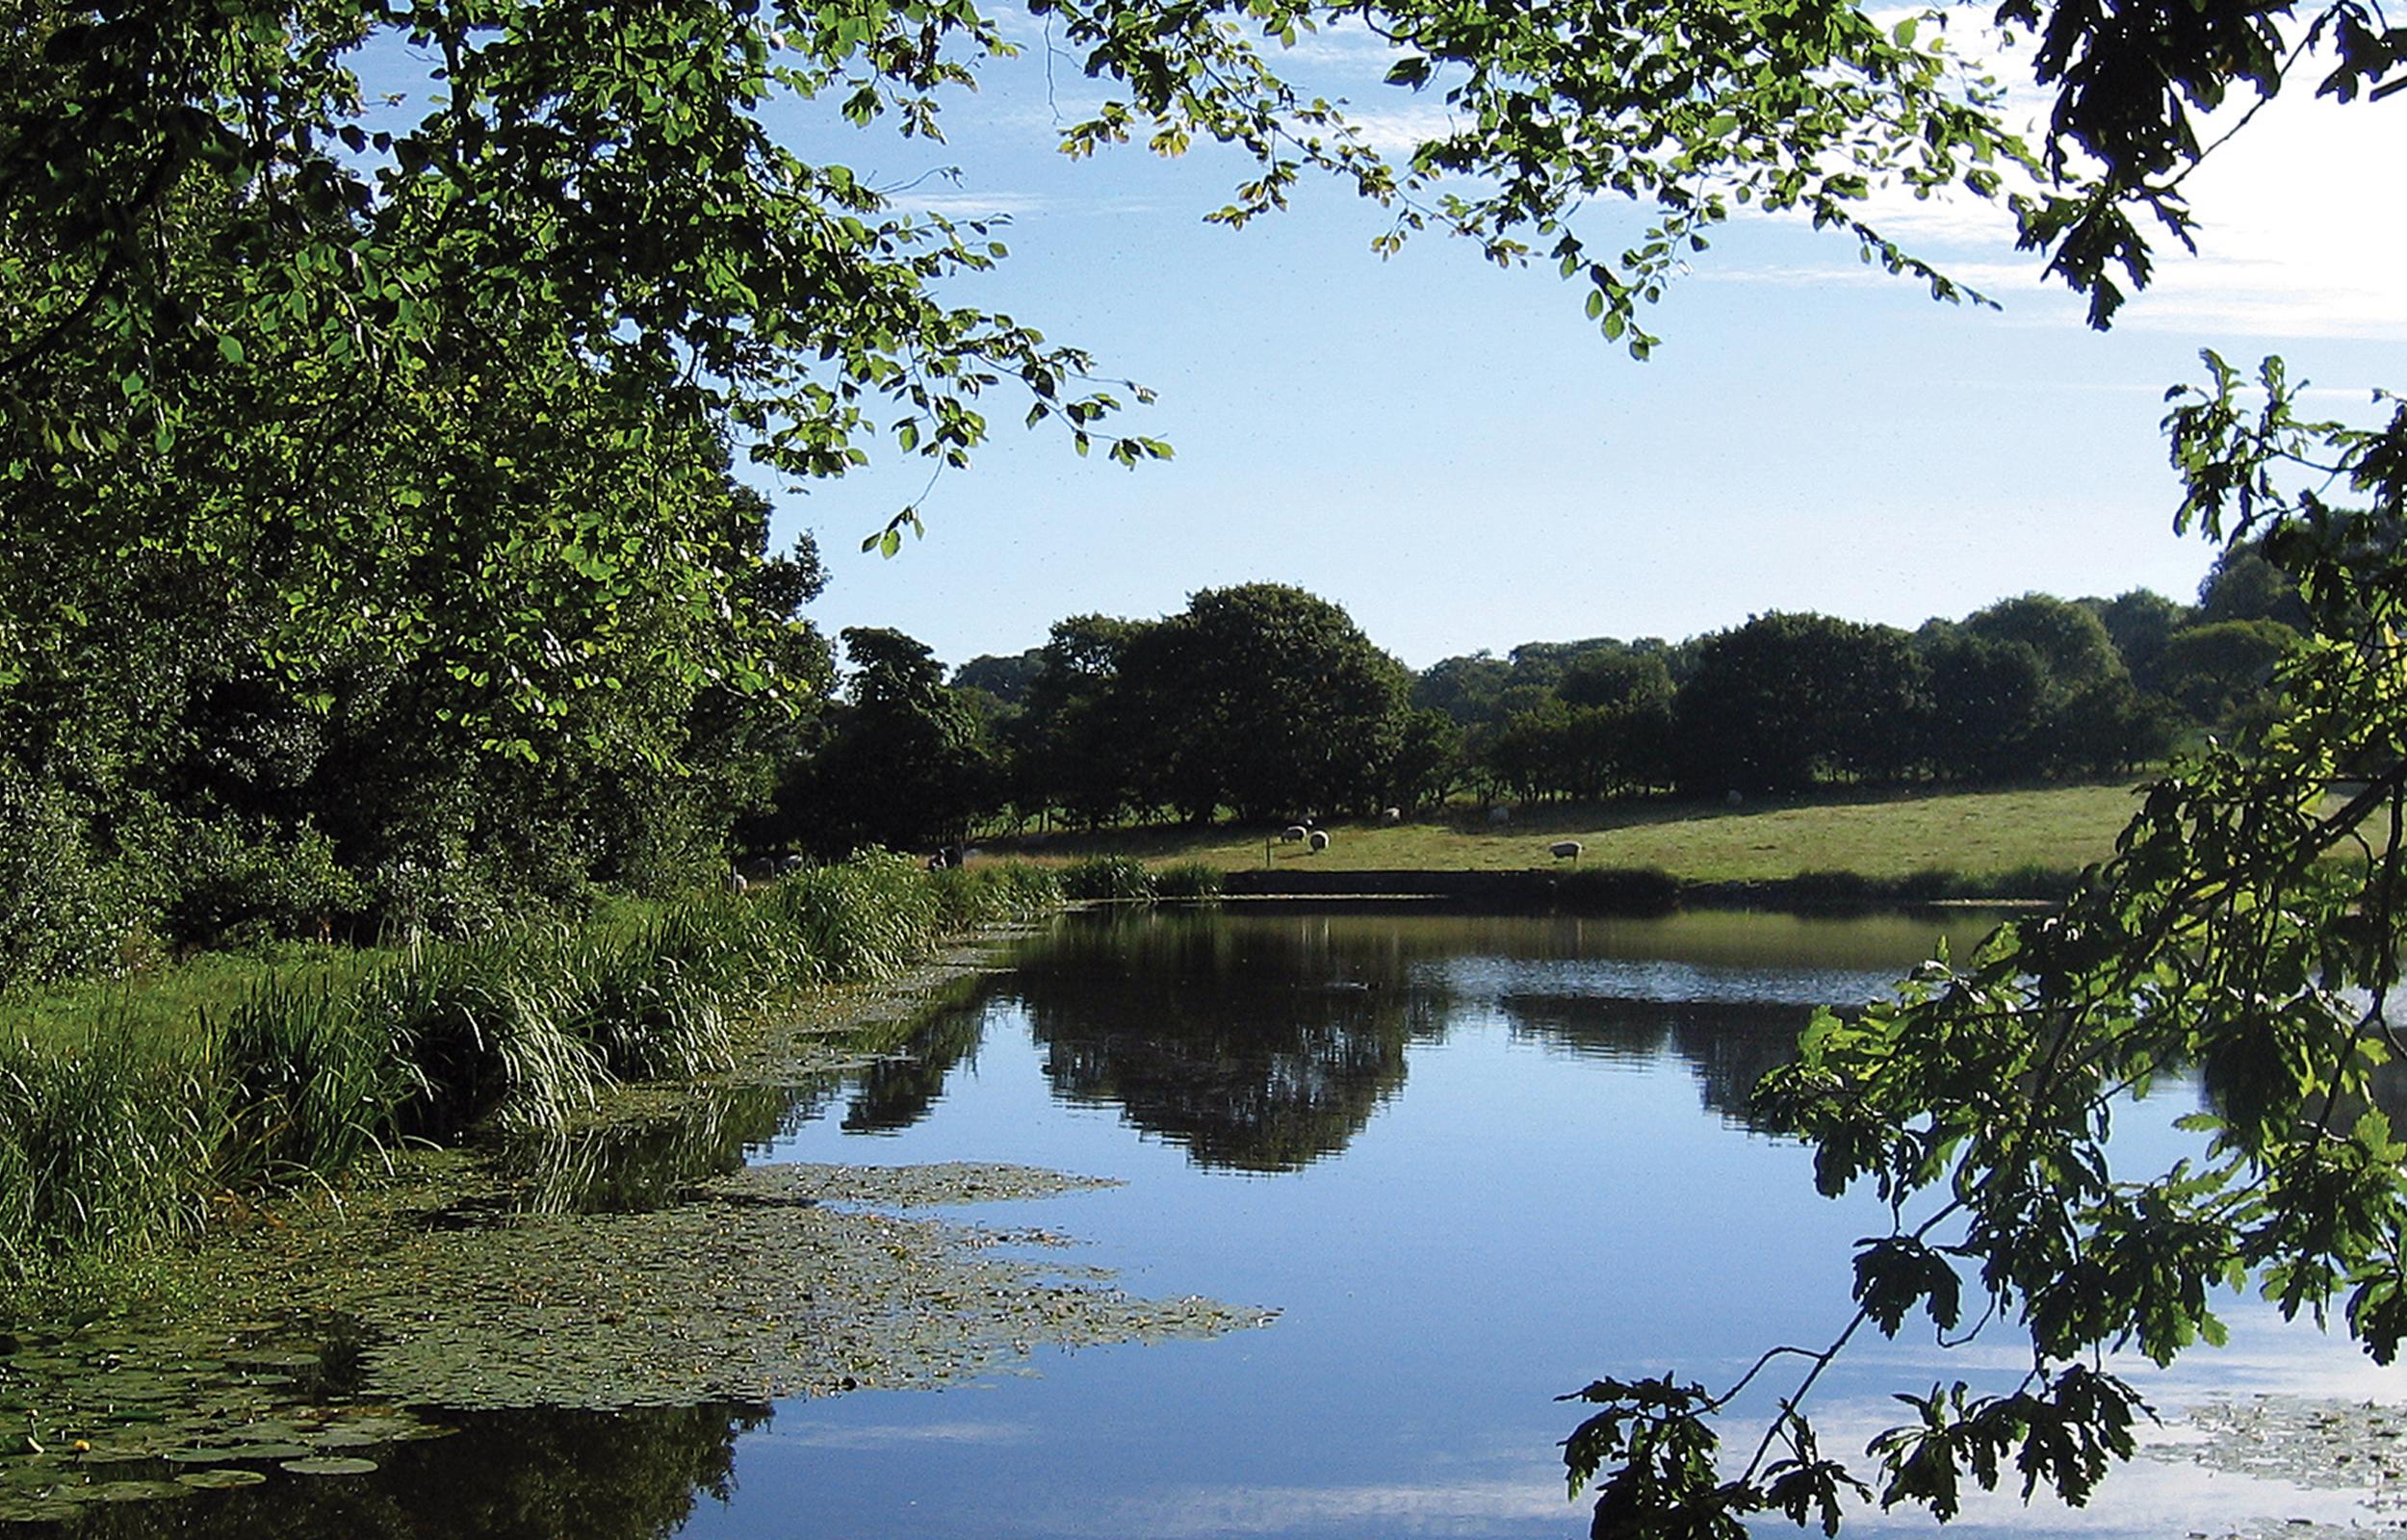 Oak Vale_A Sense of Place_Carousel_4